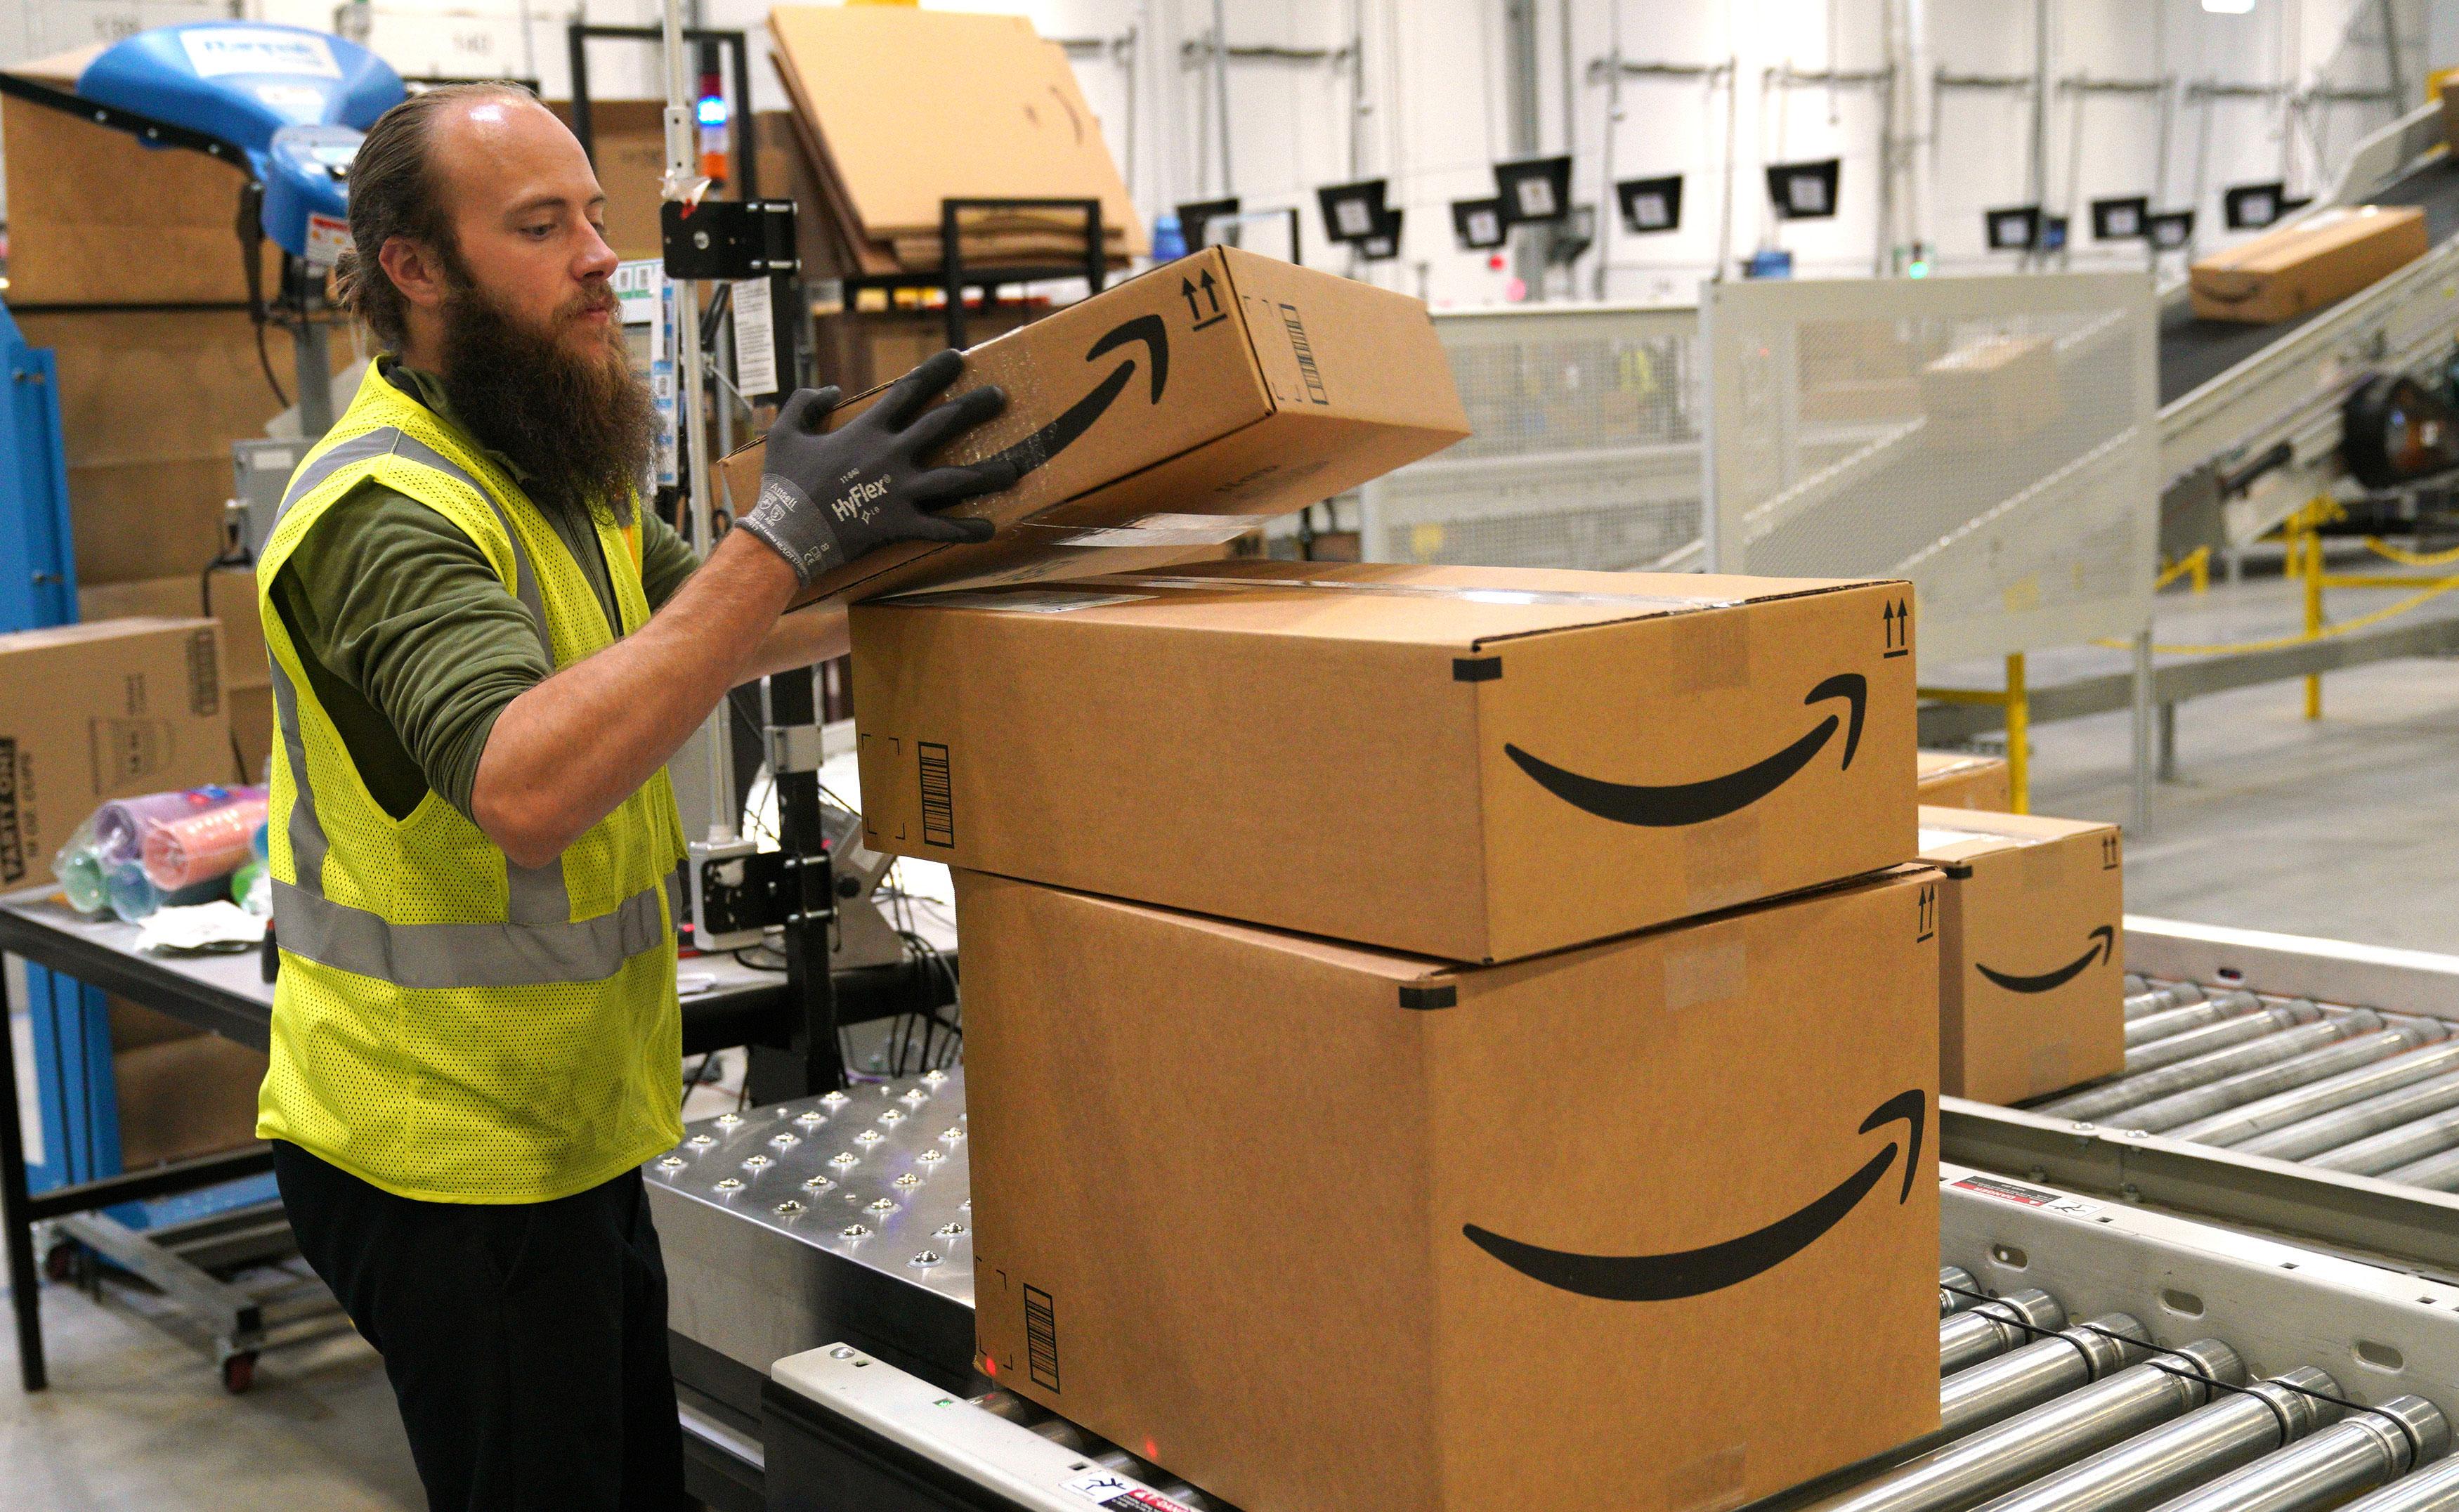 Amazon limiting shipments to certain ...